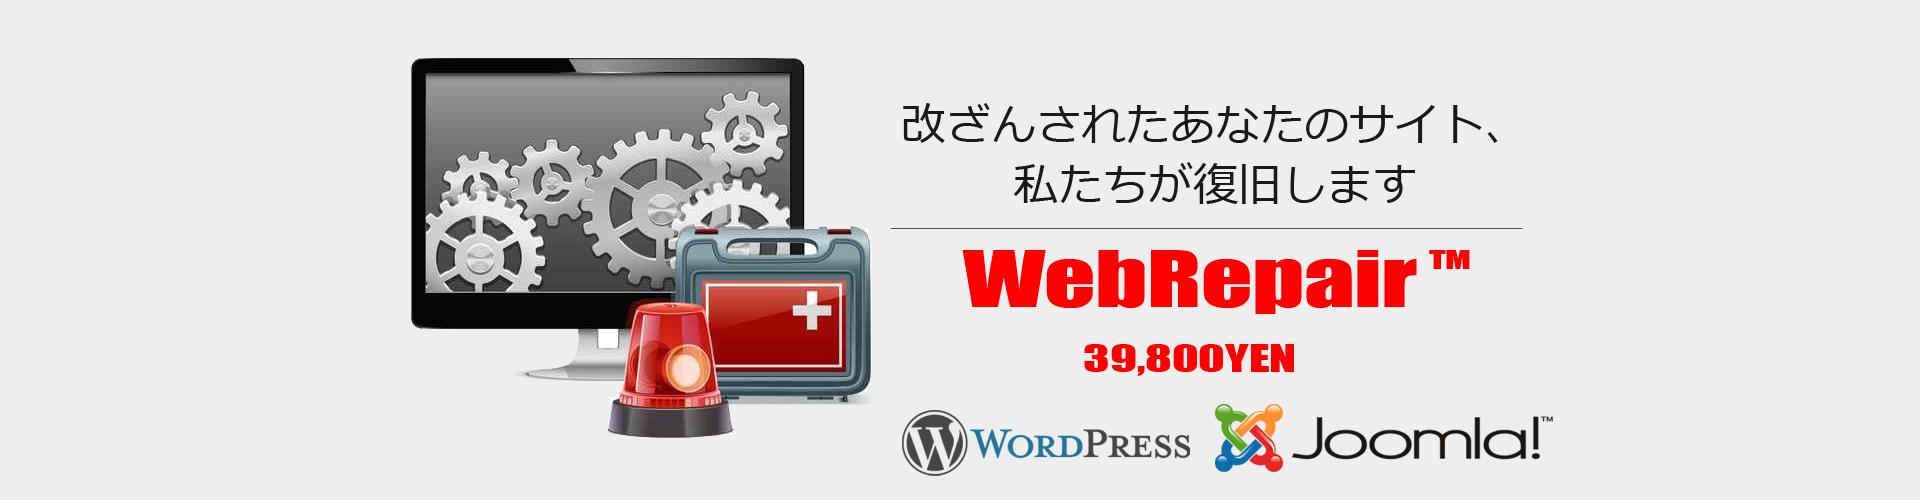 Webサイト改ざん復旧サービスWebrepair(ウェブリペア)